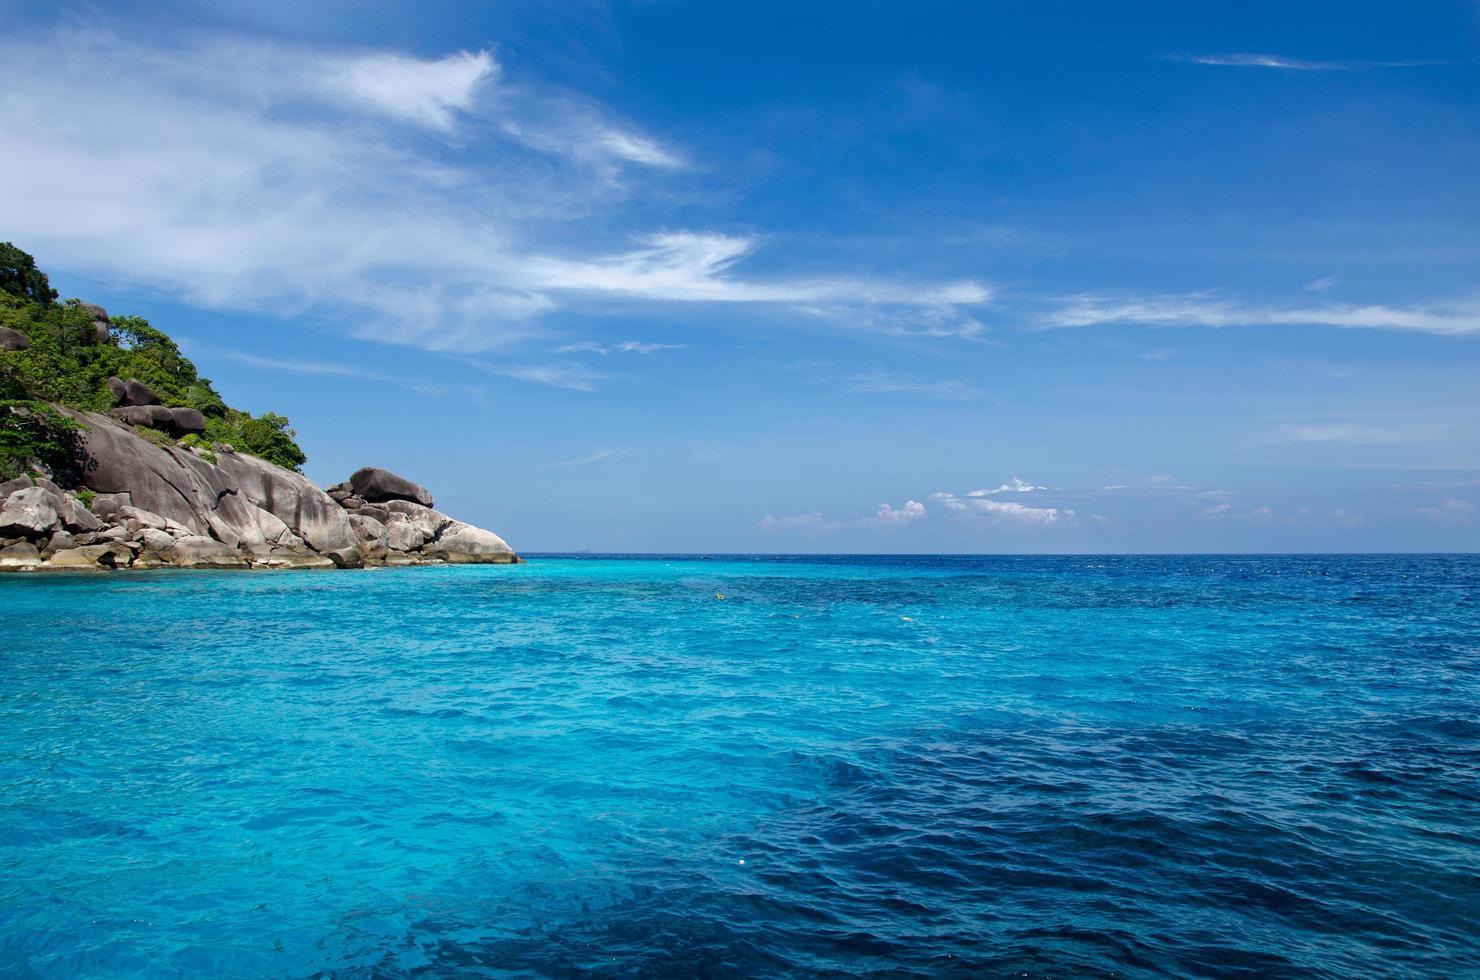 Îles Similan en Thaïlande, Asie photo